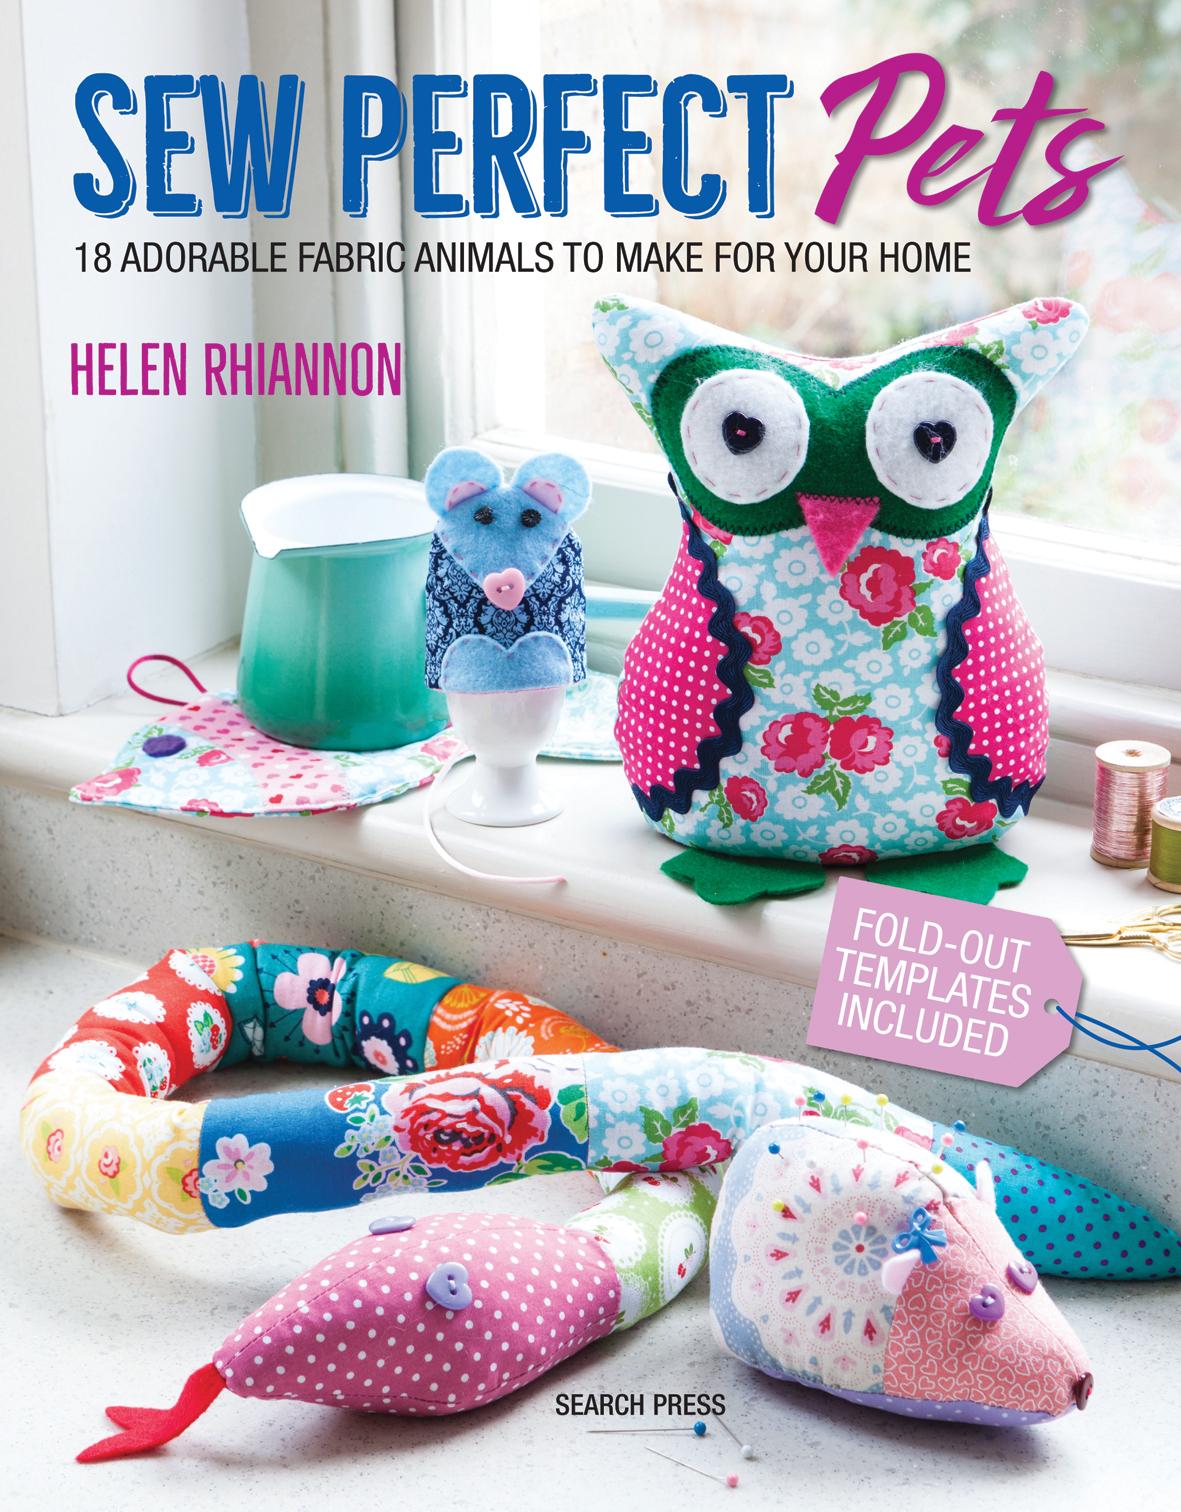 Search Press | Sew Perfect Pets by Helen Rhiannon